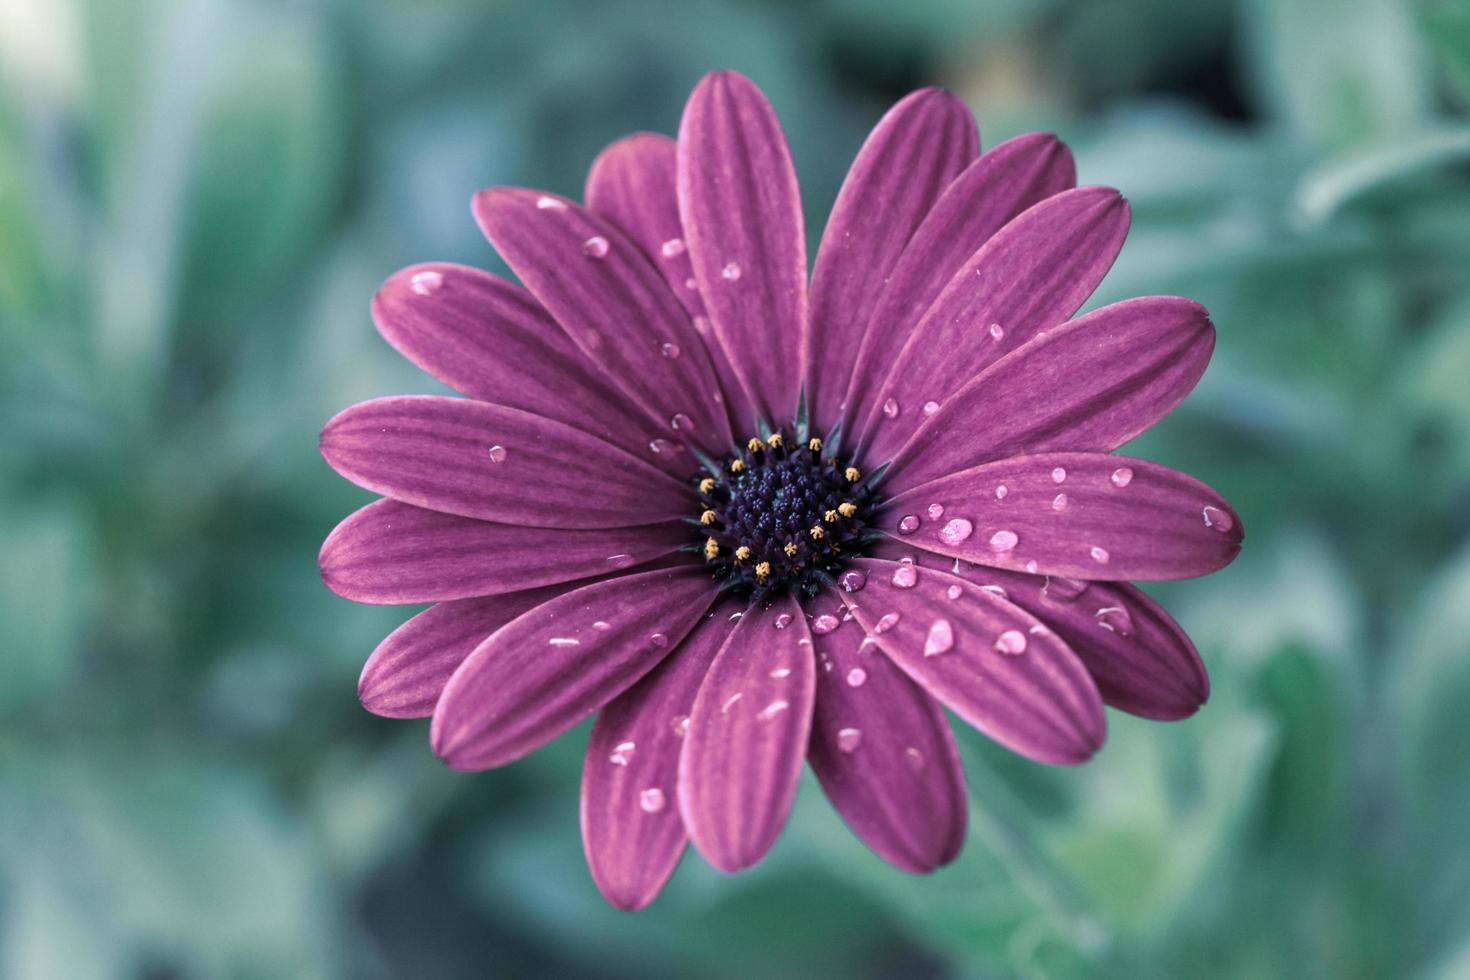 Close-up of purple daisy flower photo